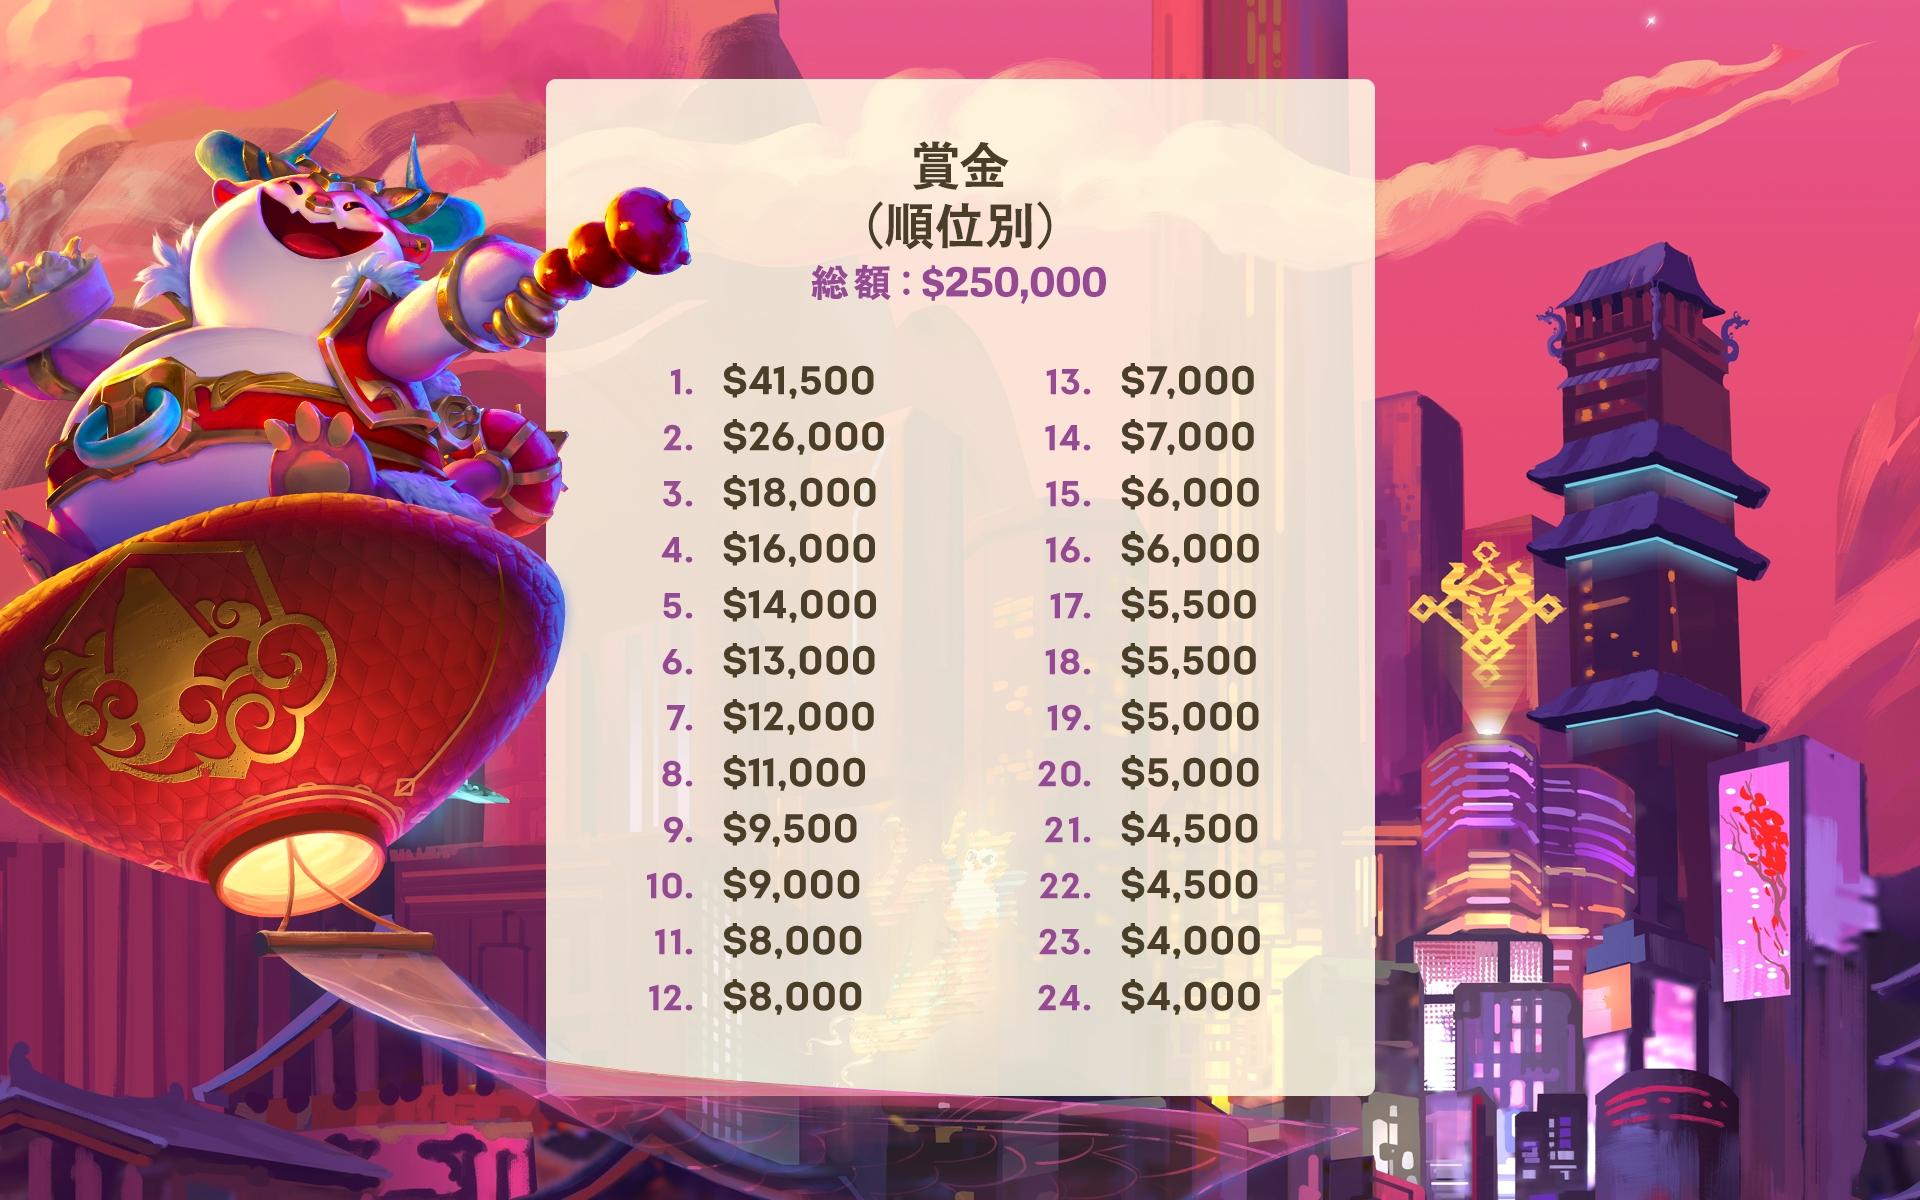 03-Prize_Pool_JA.jpg